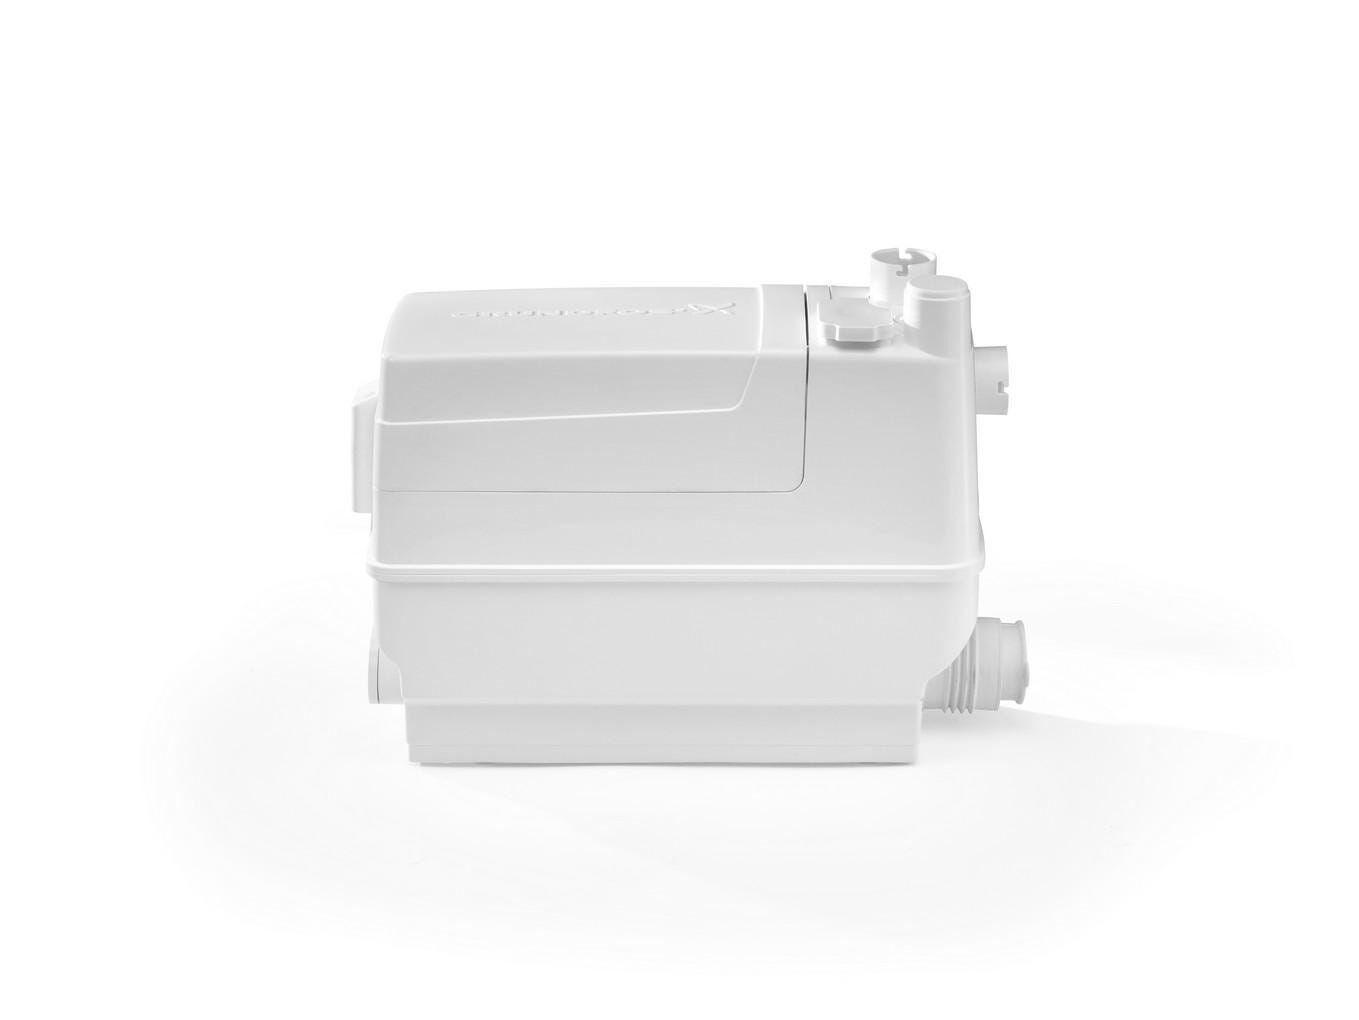 Grundfos Pompa Sololift2 C-3 Lavatrici Lavelli Cucina Vasche Docce Bidet Lavabi